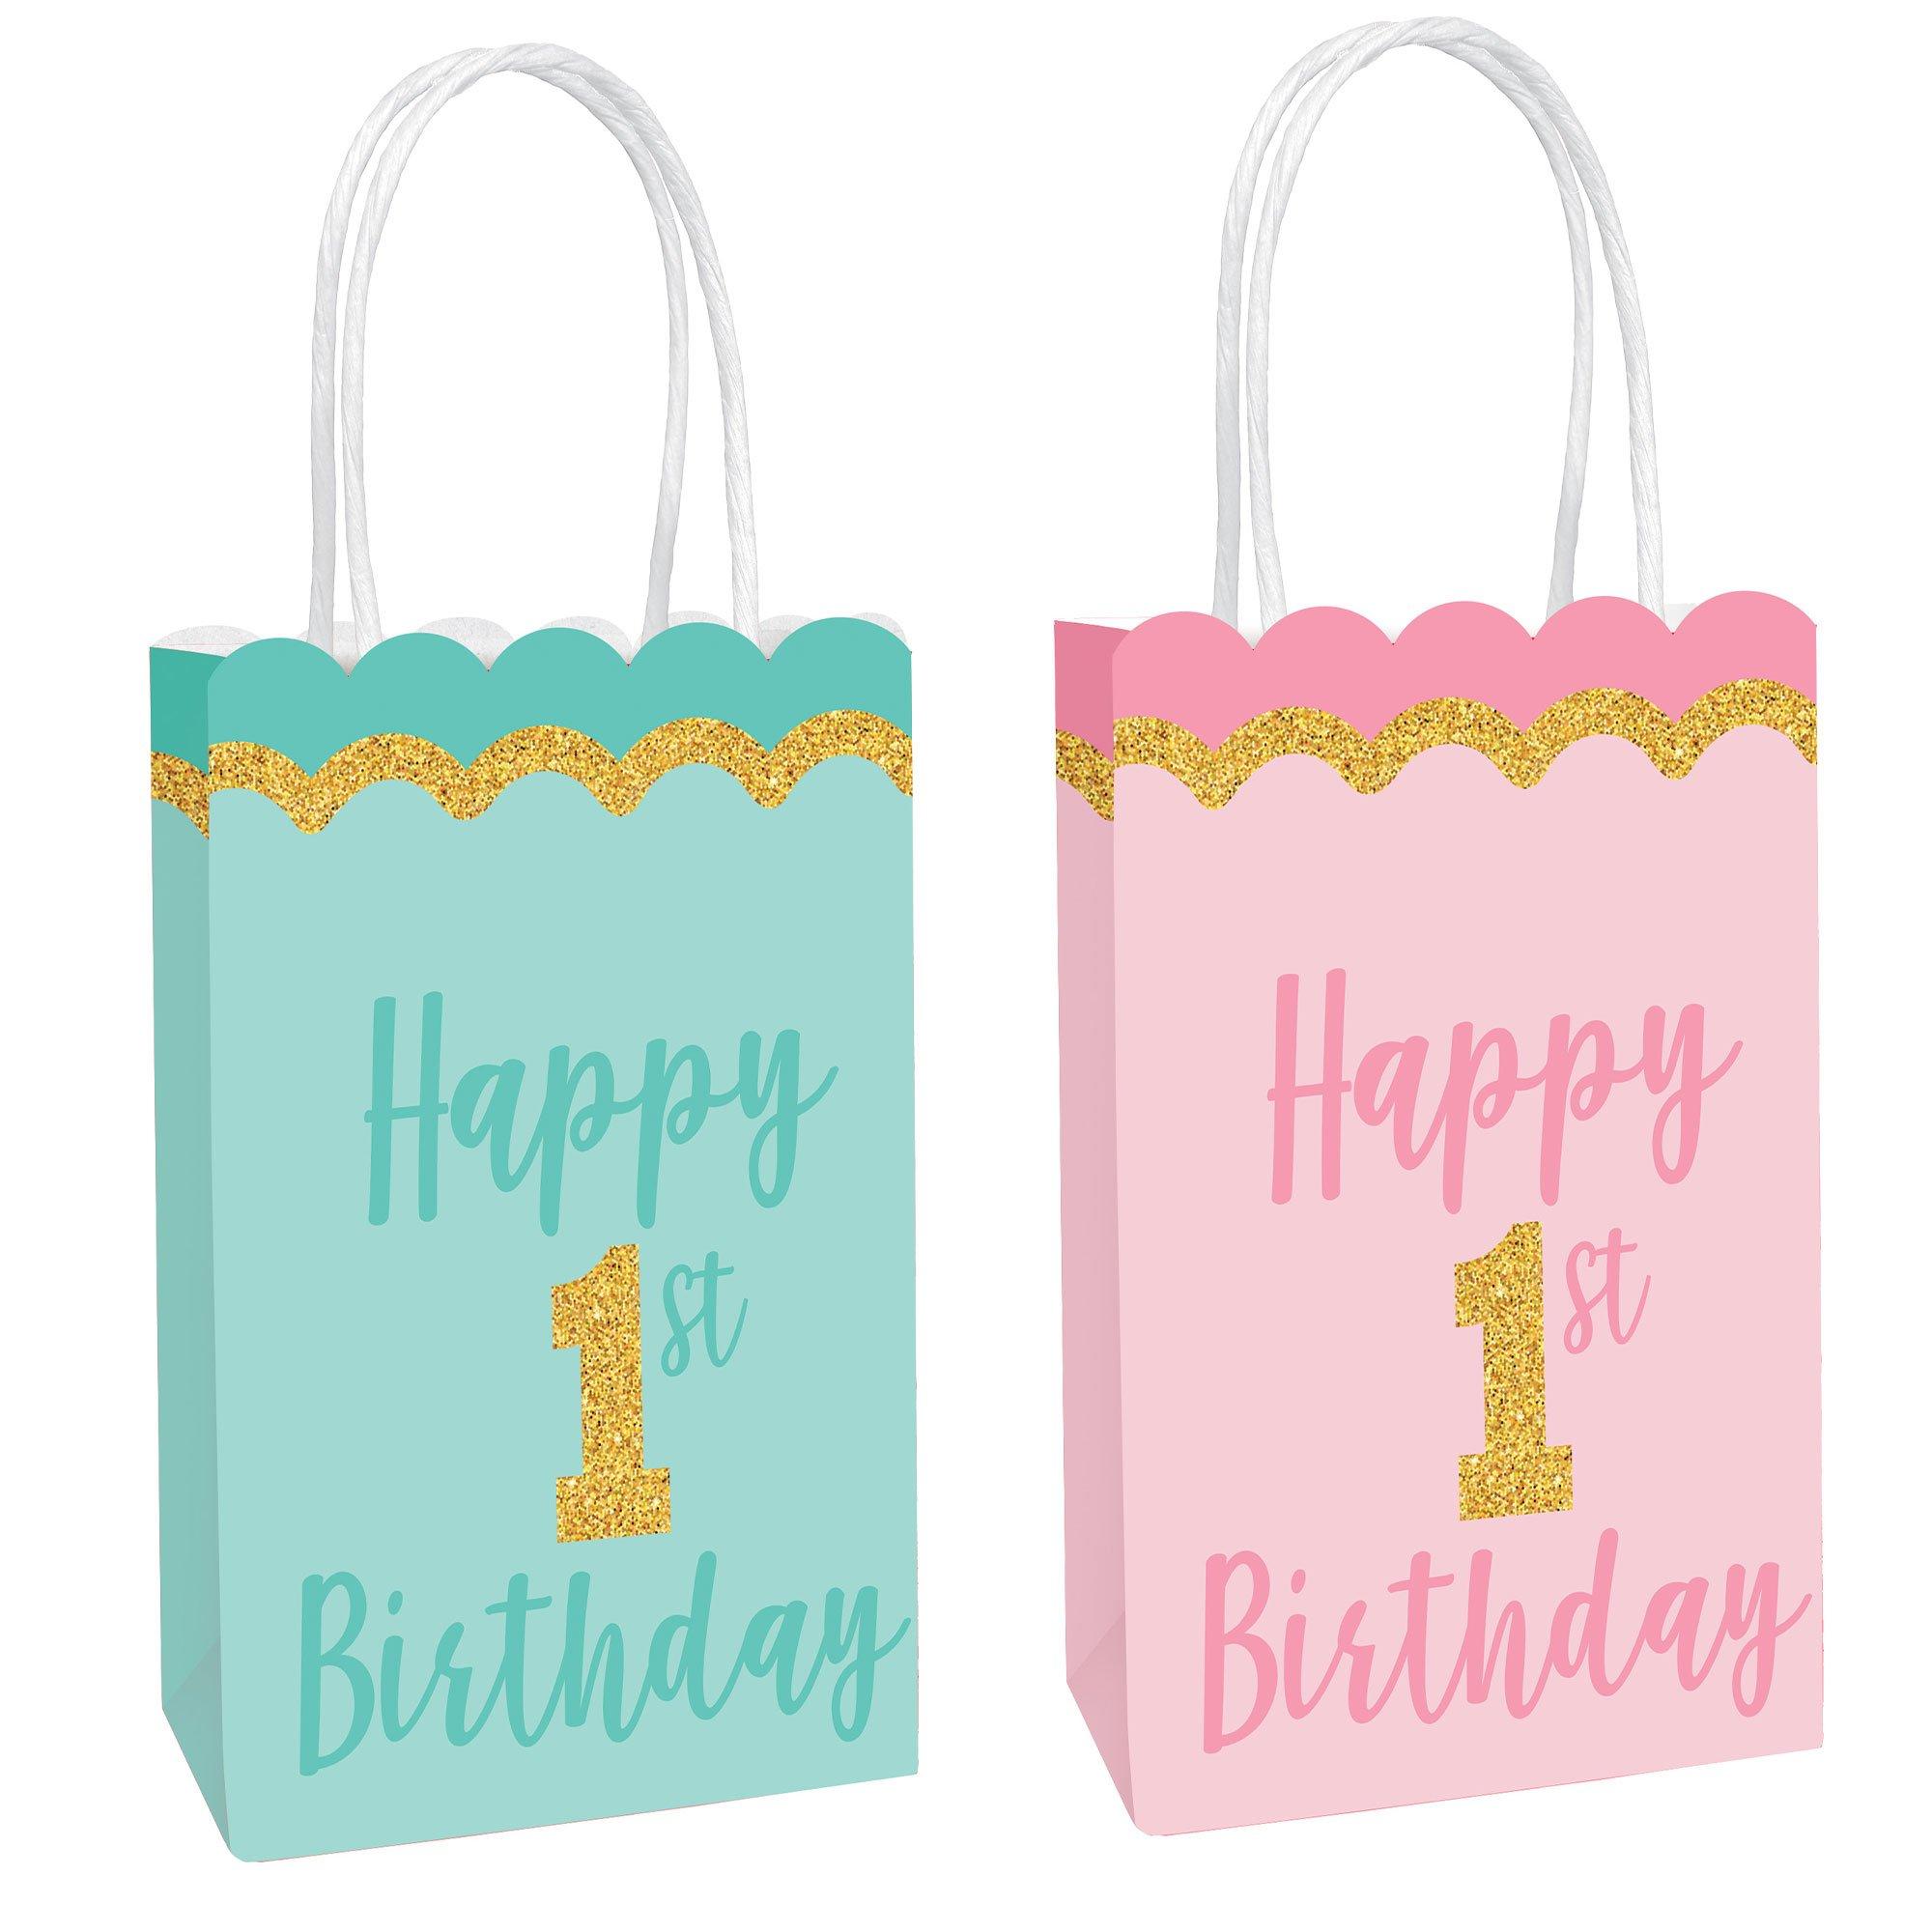 1st Birthday Glittered Kraft Bags